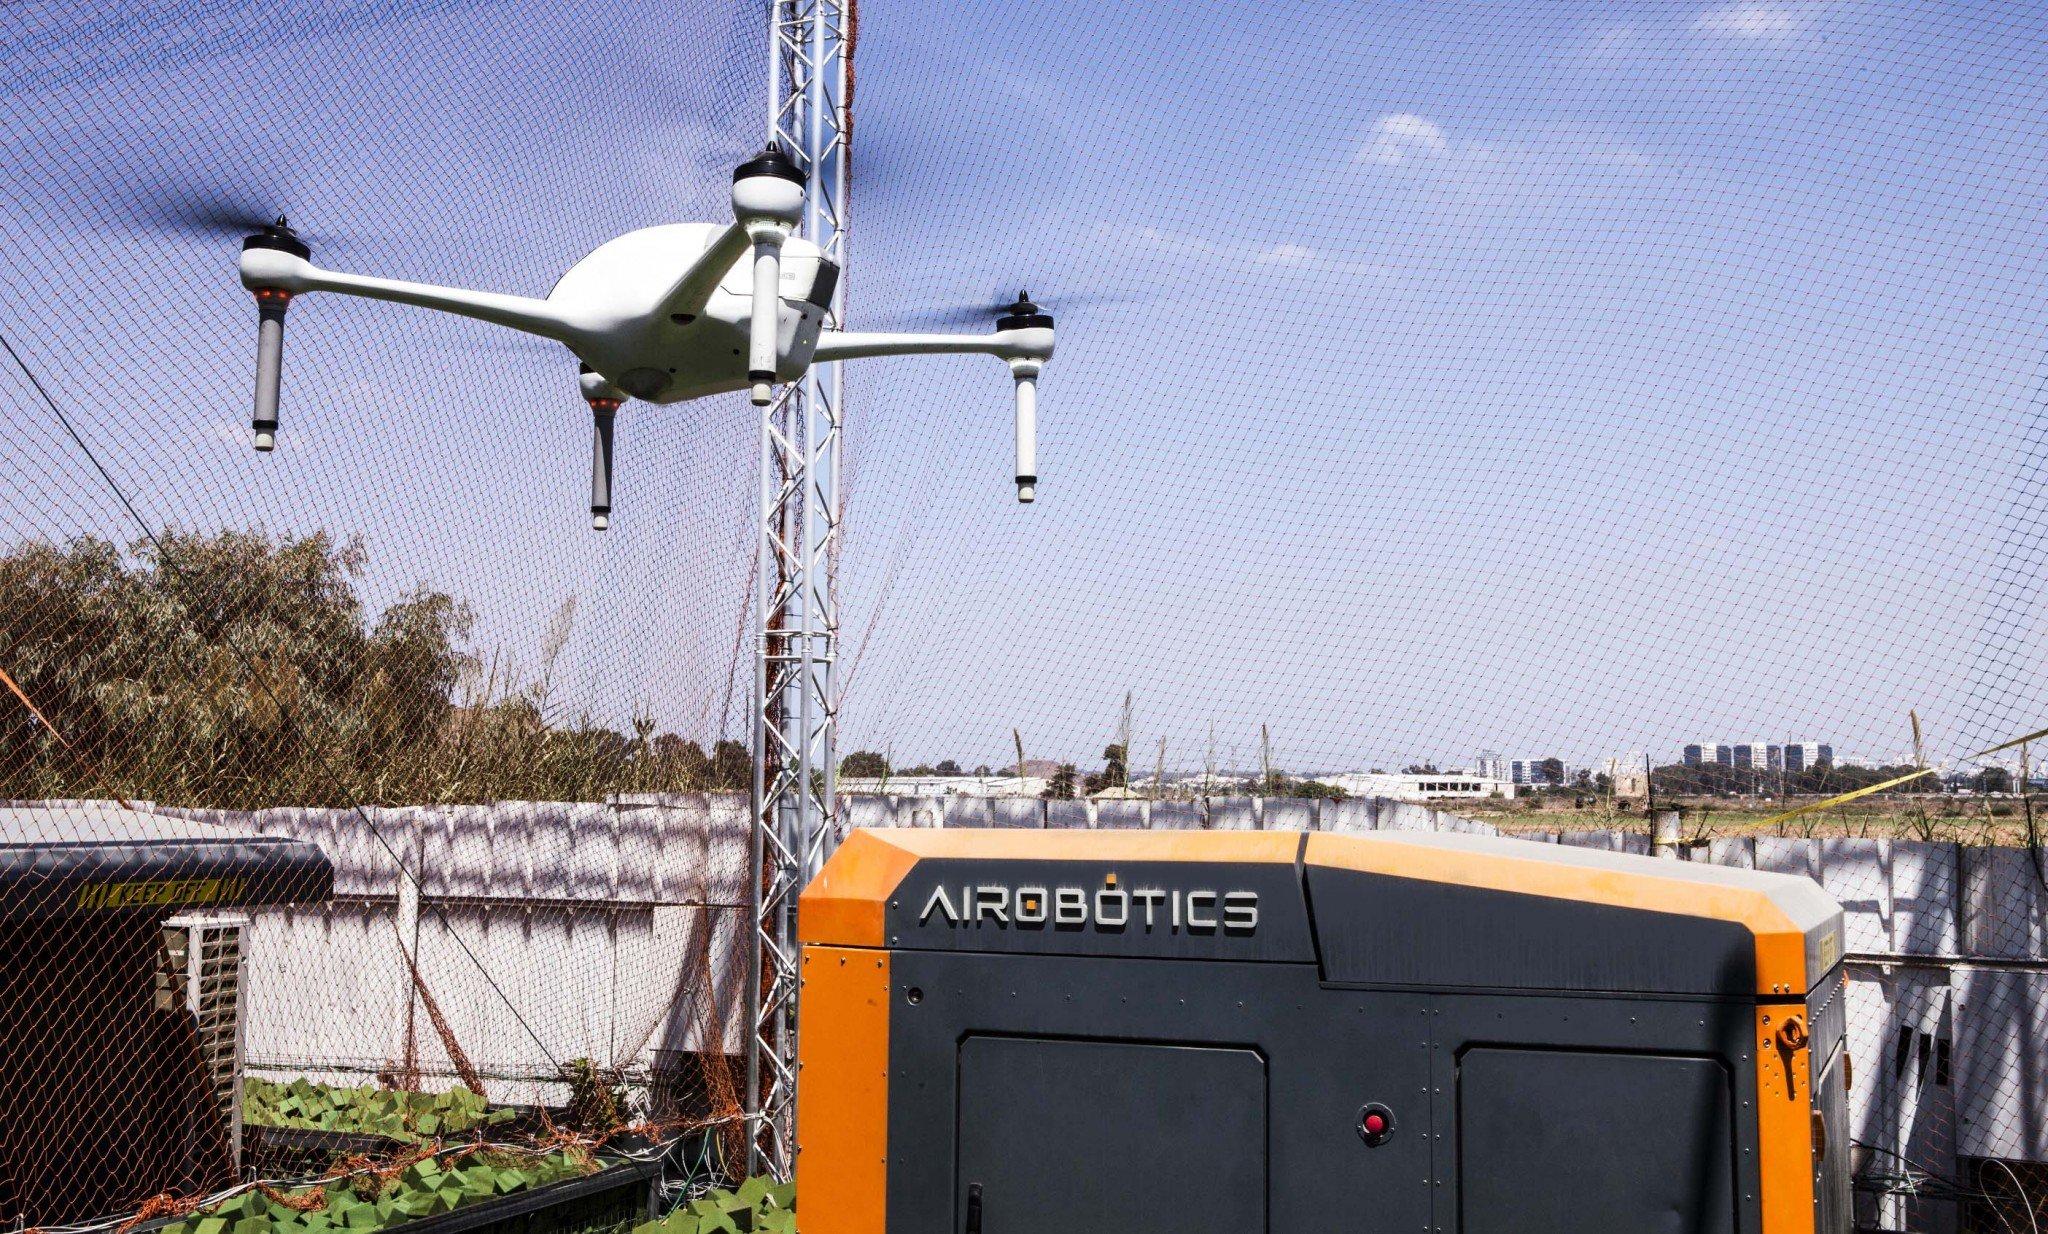 Israeli dronemaker Airobotics raises $32.5 million in funding